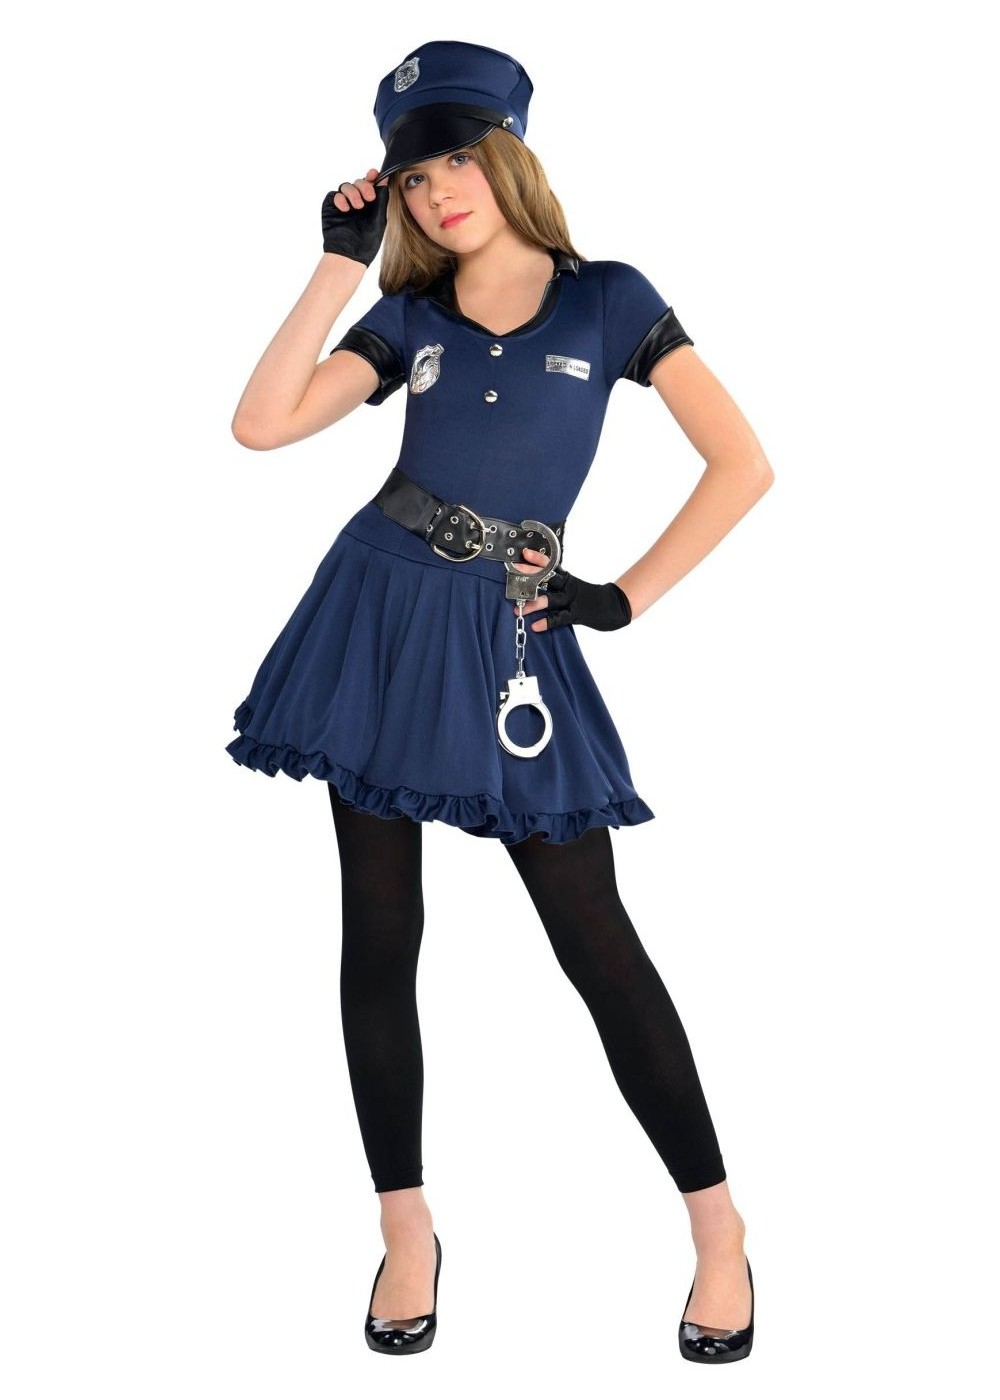 sc 1 st  Walmart & Cop Cutie Police Officer Girls Costume - Walmart.com